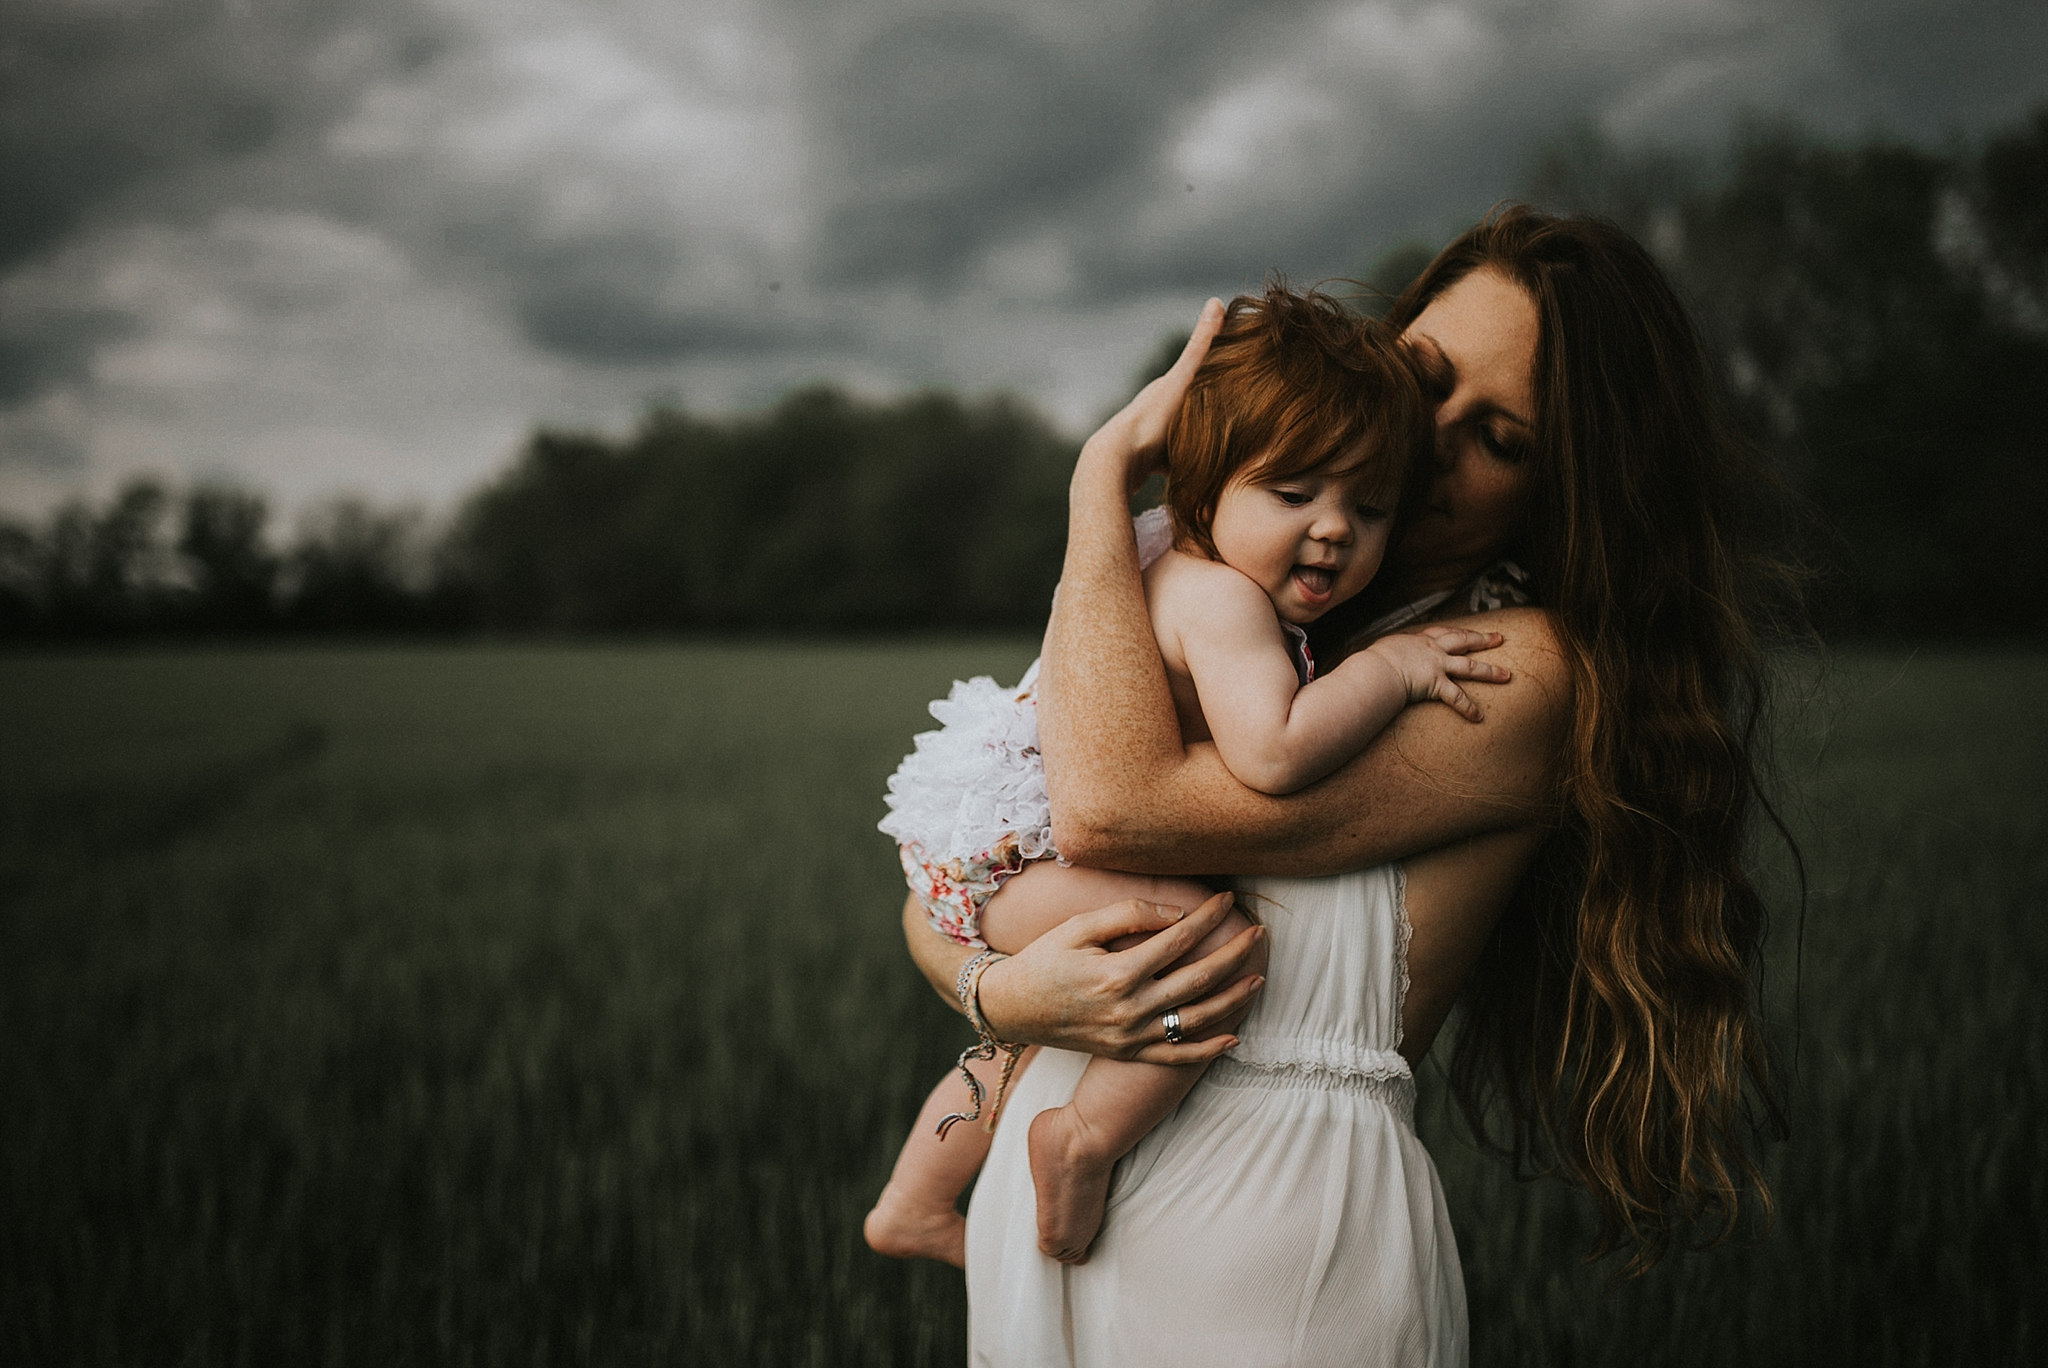 twyla jones photography - mother daughter - field and forest-4381_treasure coast florida.jpg